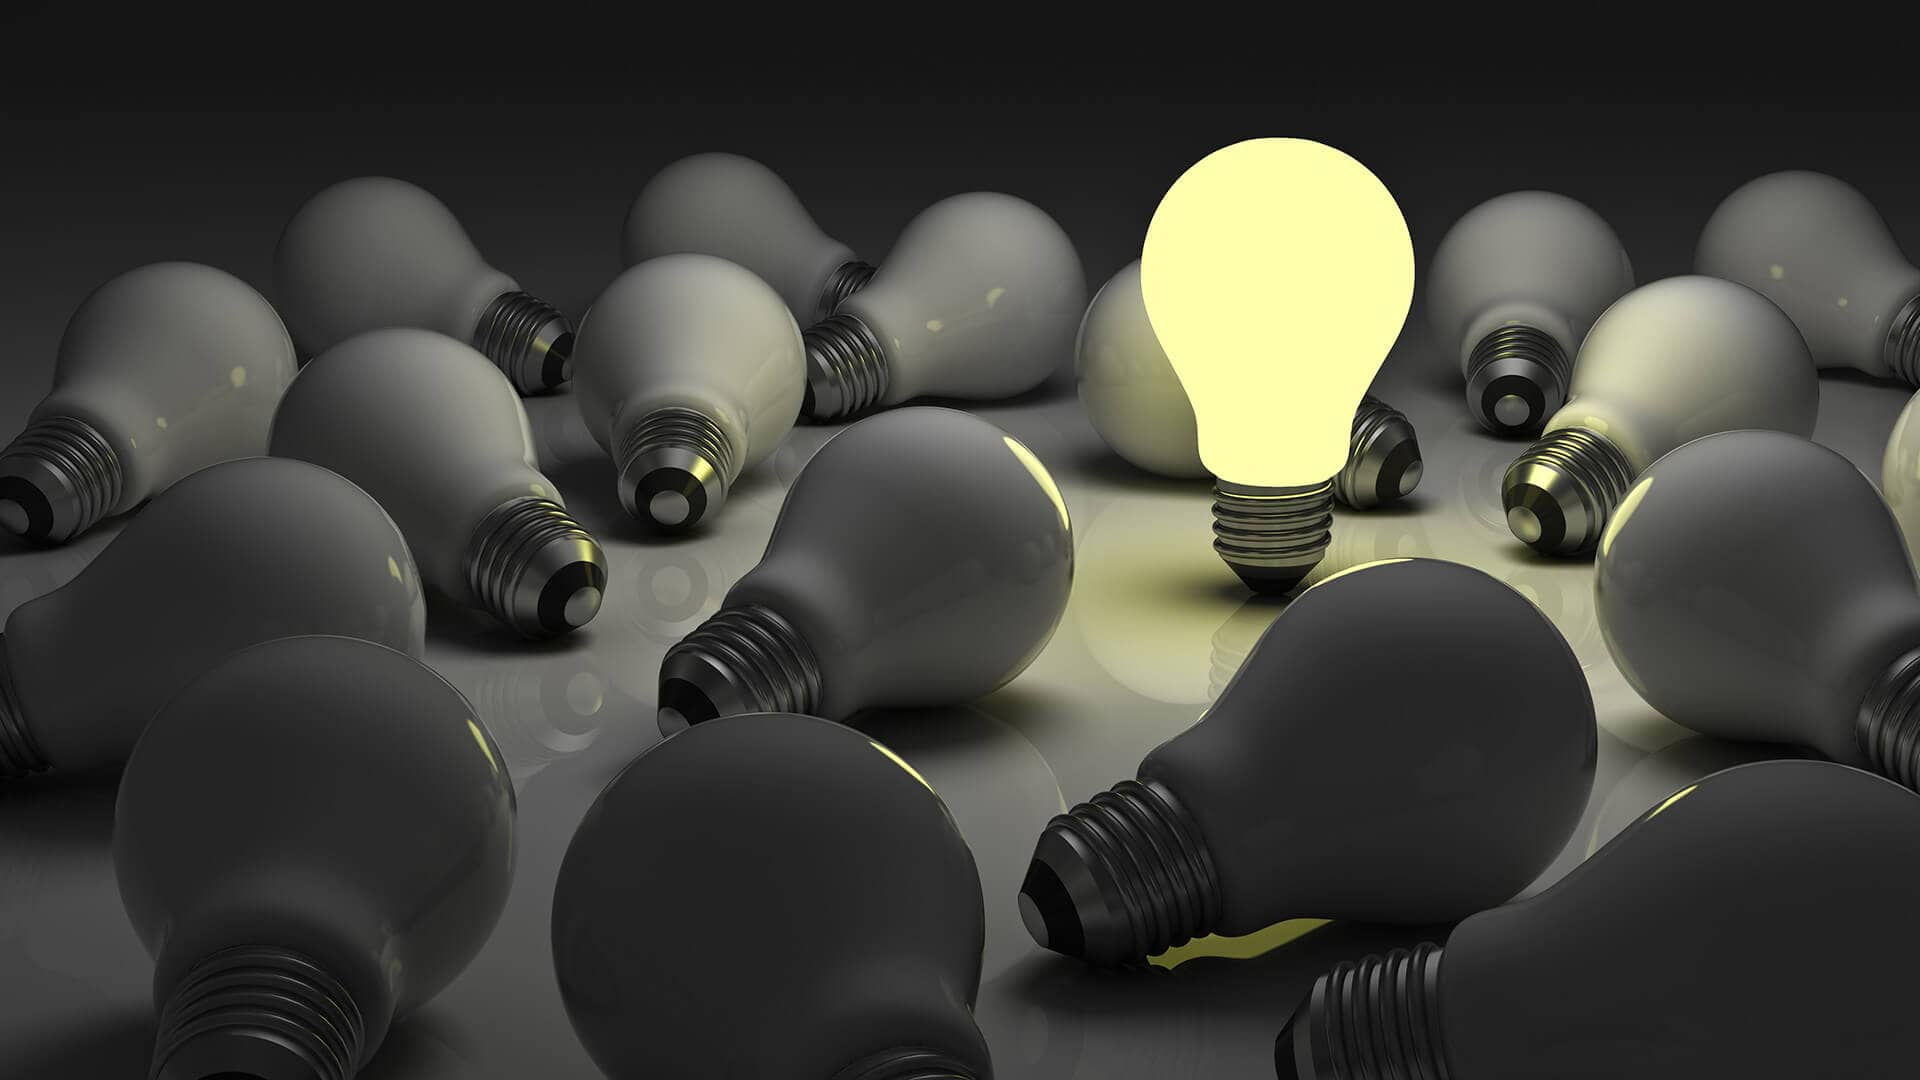 light bulb idea discovery unique different ss 1920